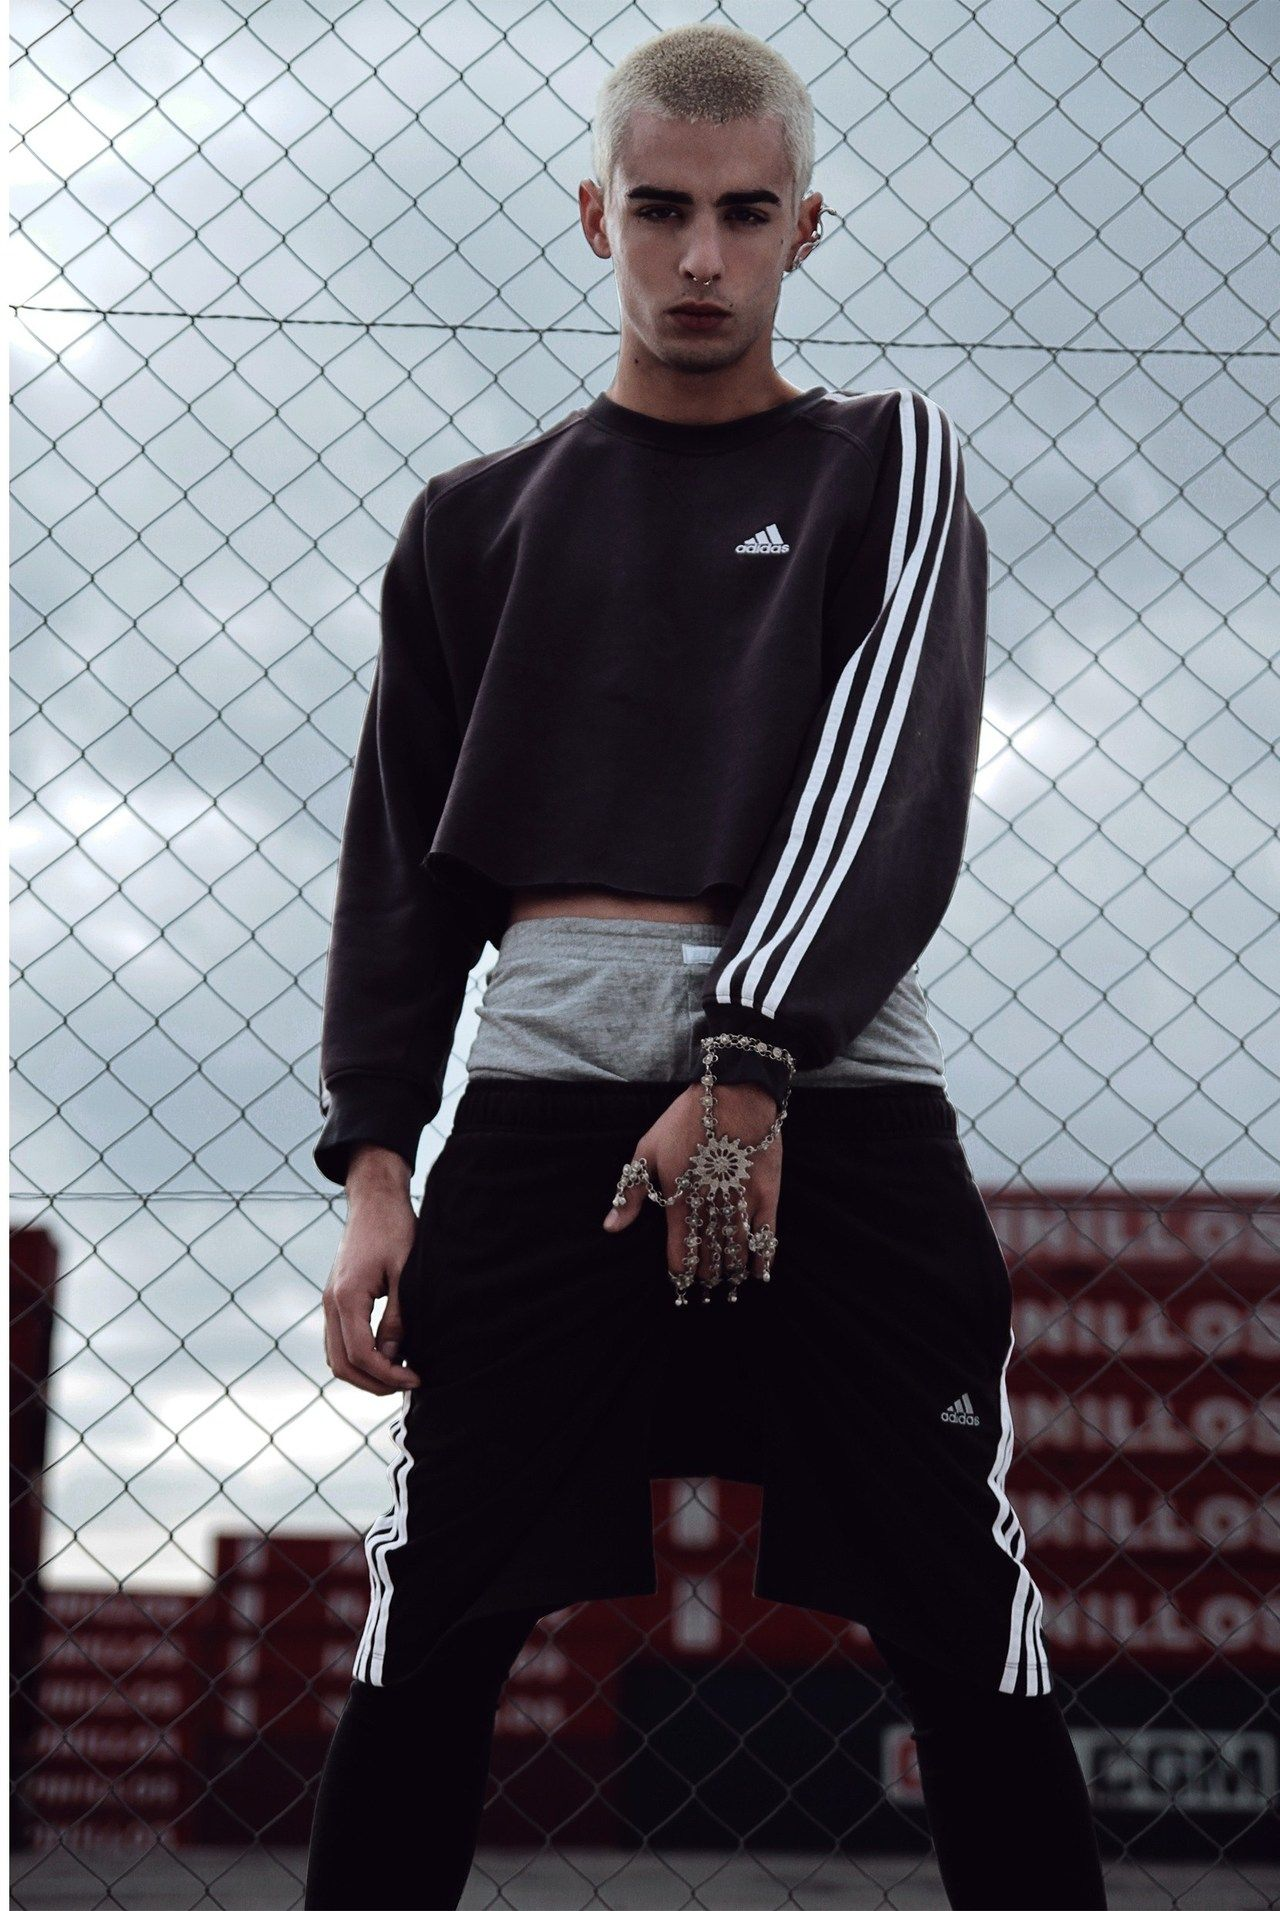 health goth goth sportswear high top sneakers menswear pants